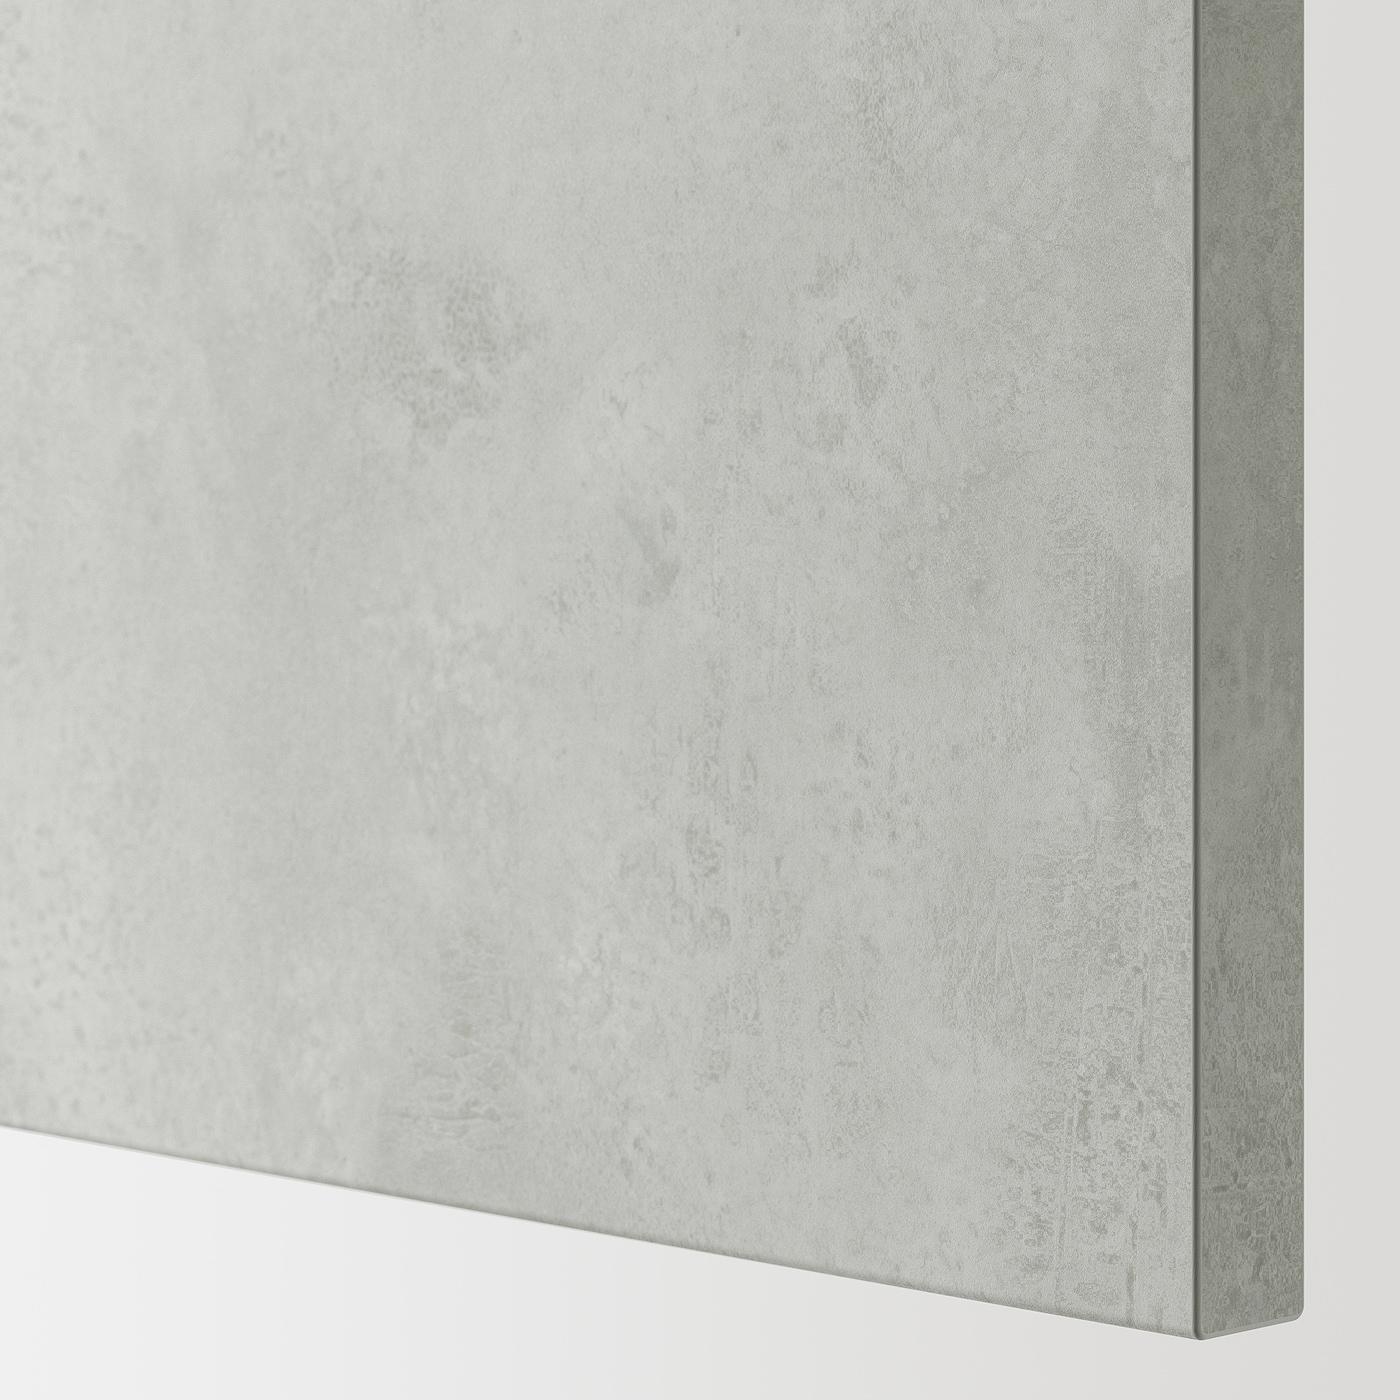 ENHET خزانة حائط مع رف/باب, أبيض/تأثيرات ماديّة., 60x32x60 سم